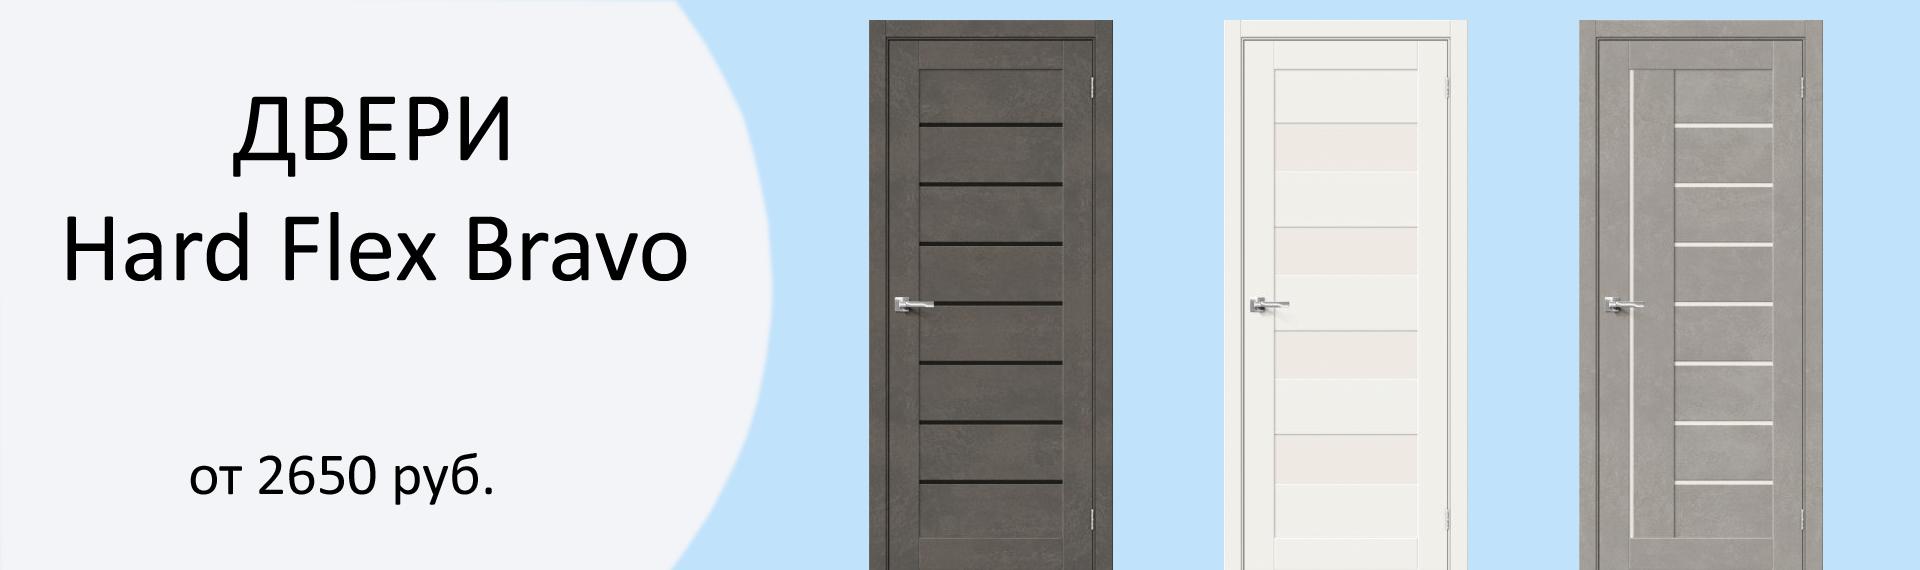 стальная дверь коломна цены